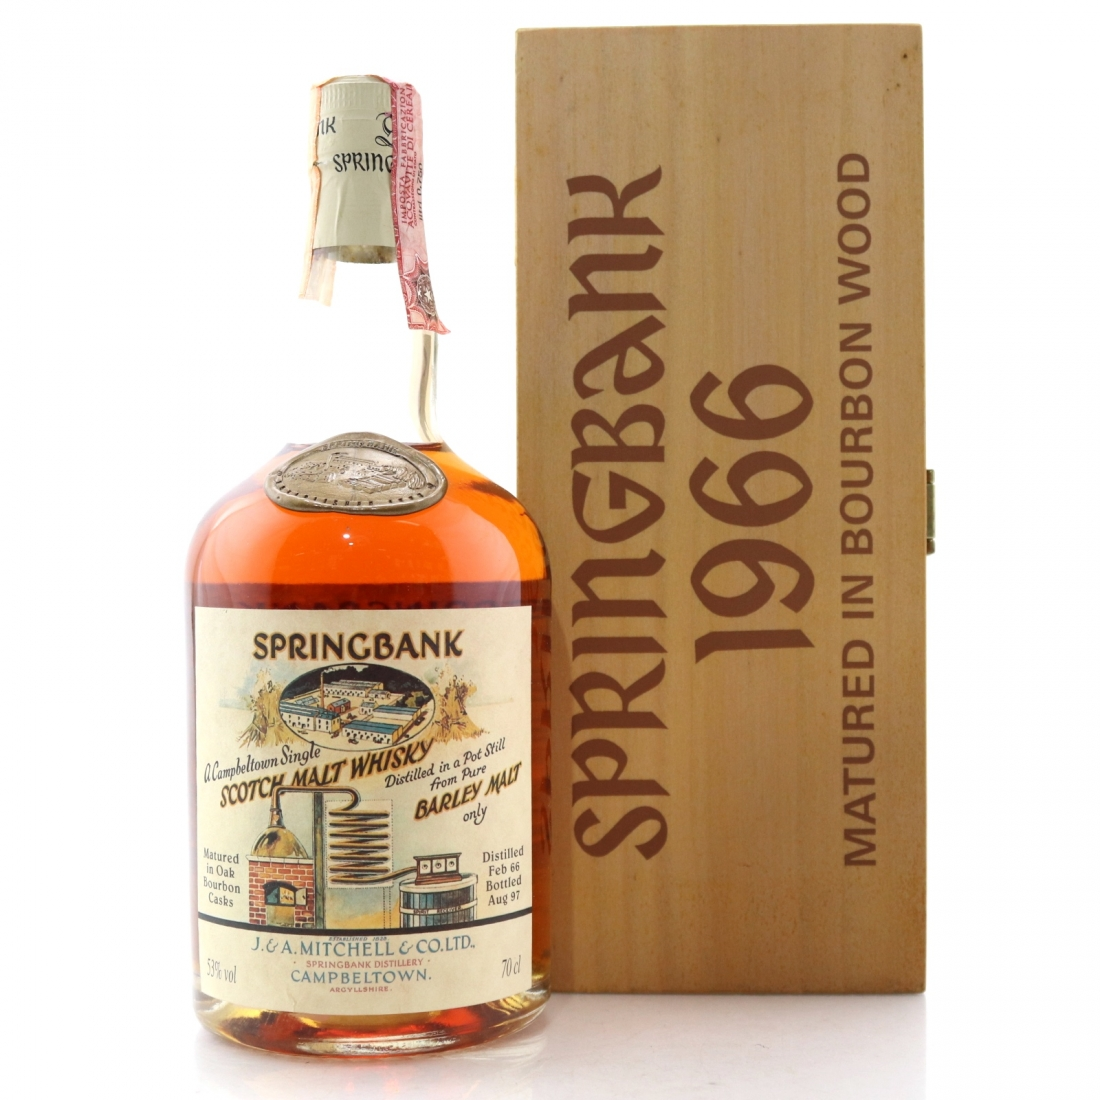 Springbank 1966 Bourbon Cask 31 Year Old #484 / Local Barley